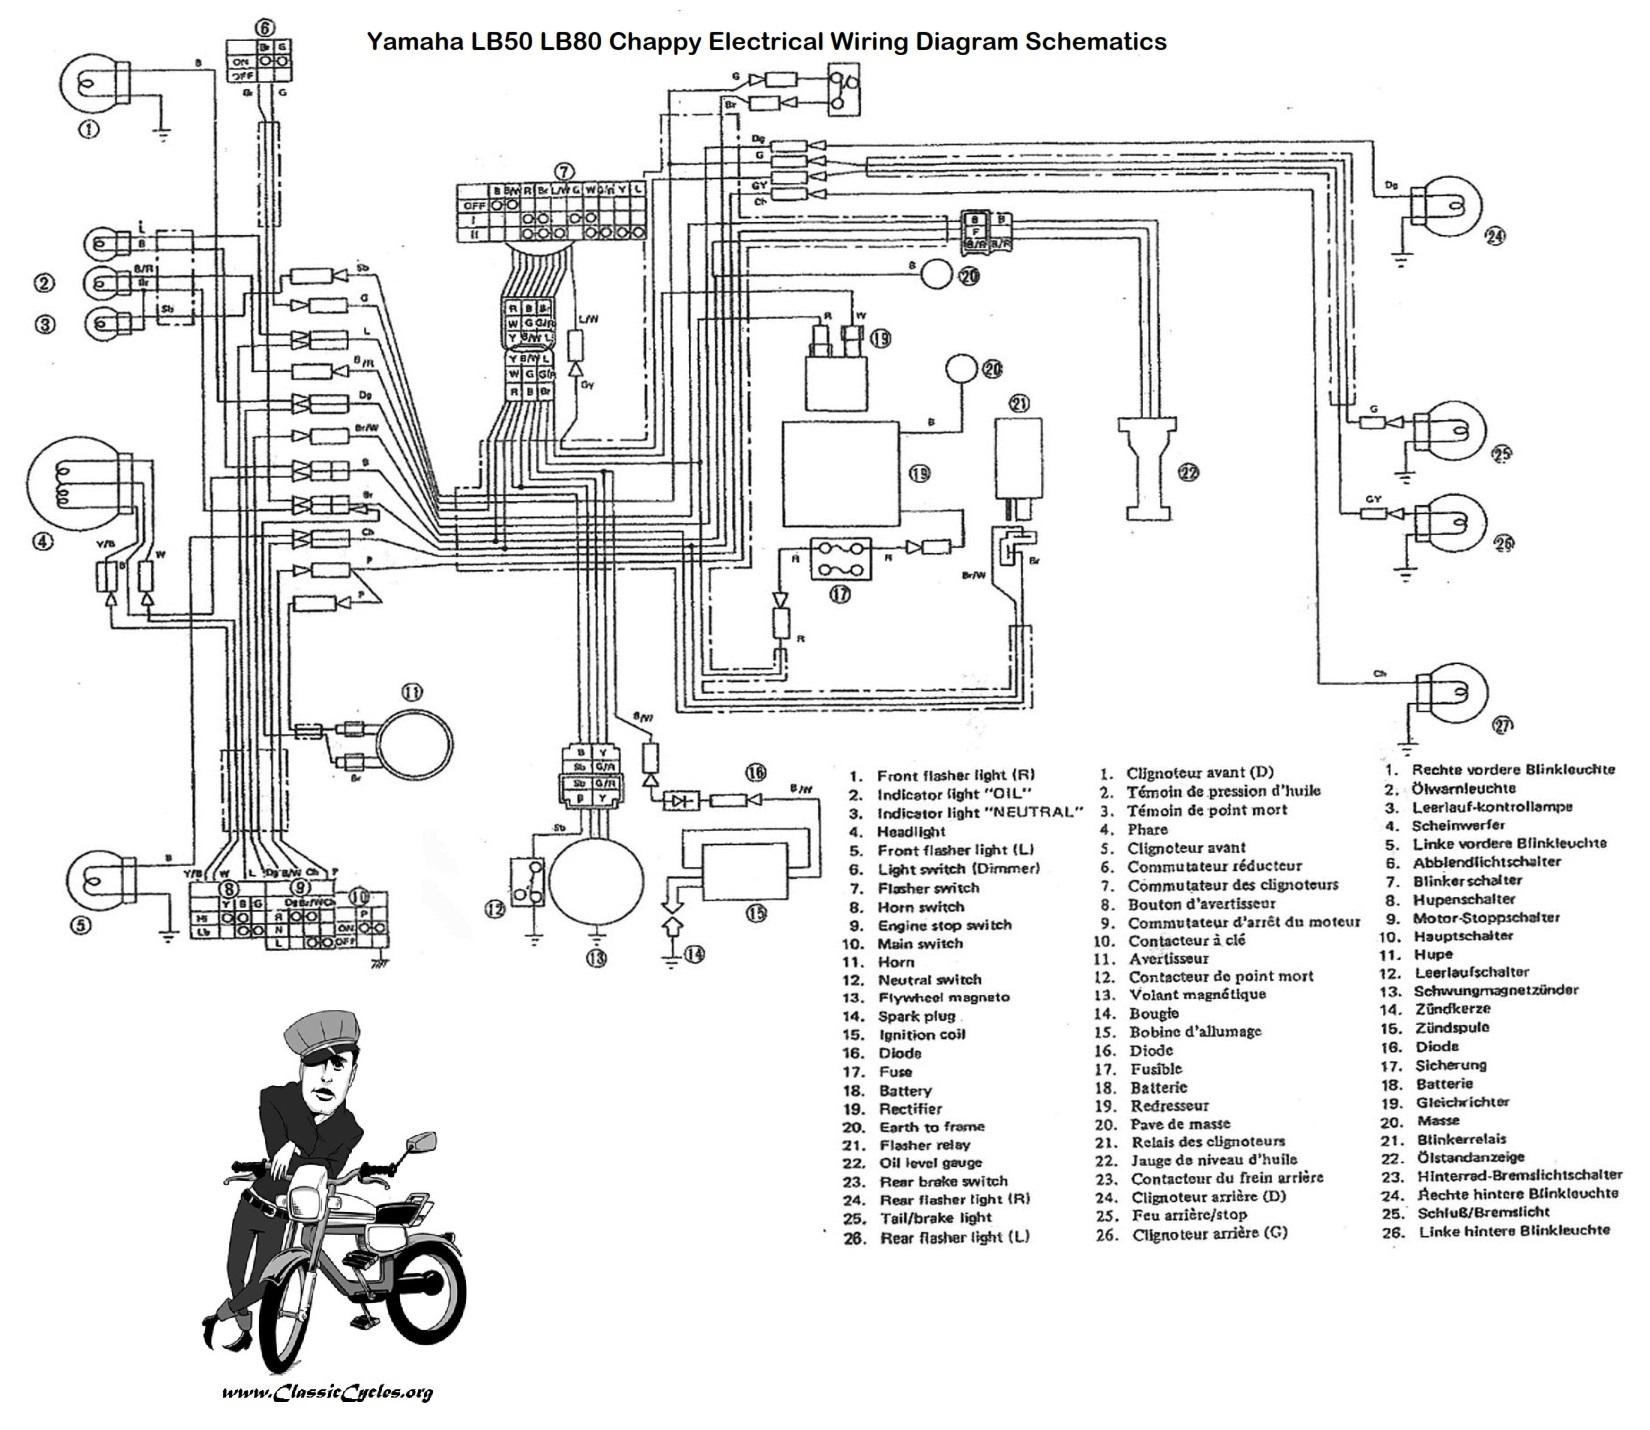 Yamaha Enduro Wiring Diagram - Yamaha Chappy Wiring Diagram Wiring Diagram  Options Sound Nest Sound Nest Studiopyxis It - See also recherche wirring  diagrams pour un yamaha hdpi 300 2 stroke 2006 , | Dt1 Wiring Diagram |  | my location google maps